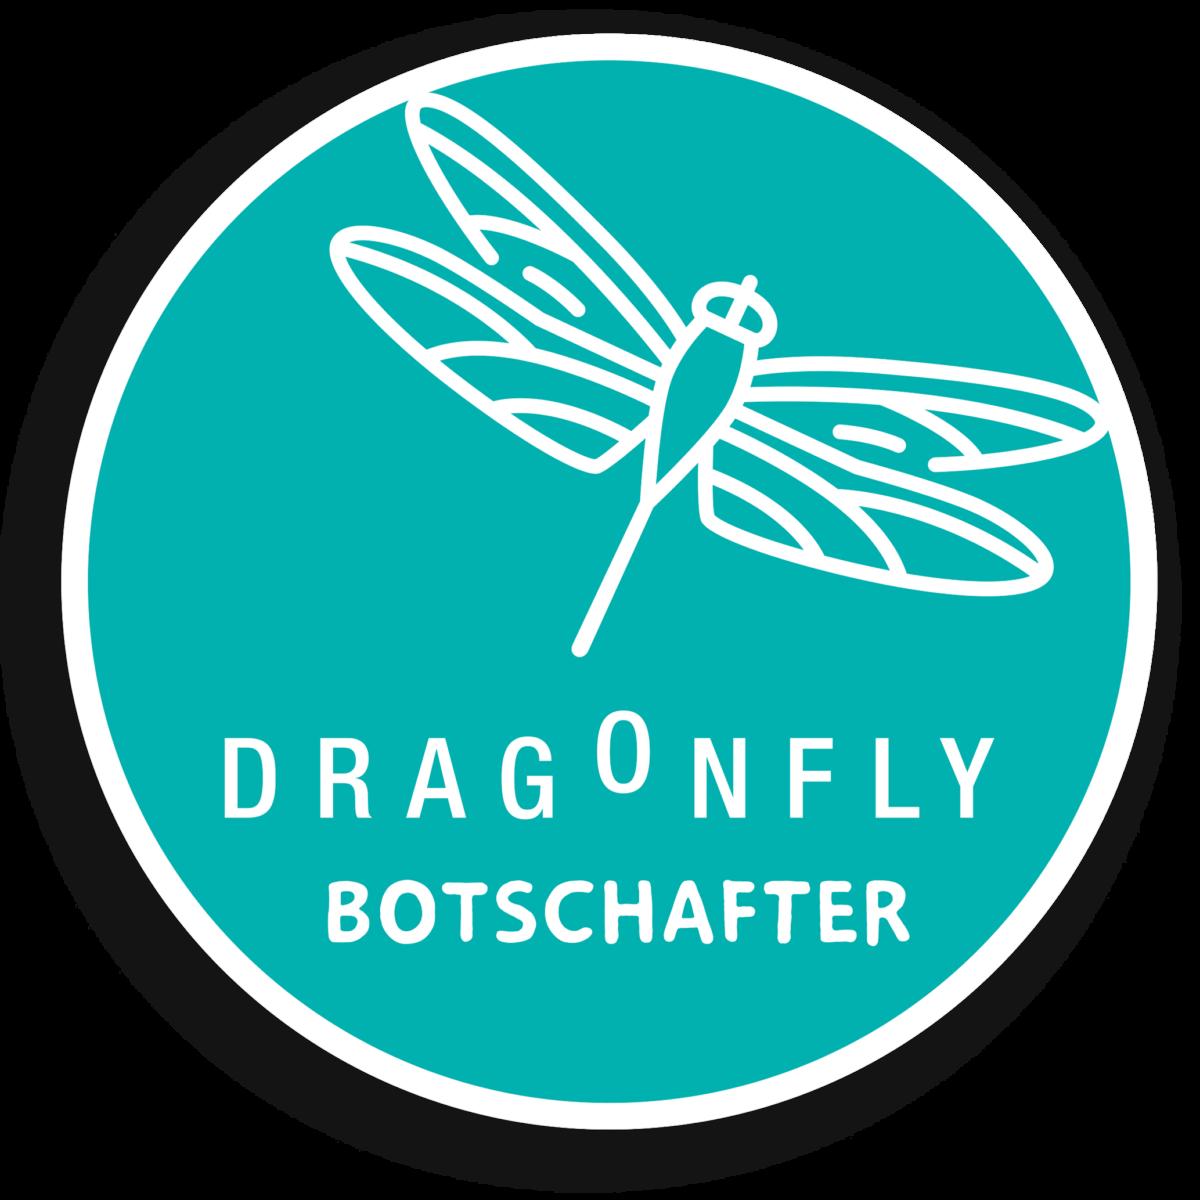 Dragonfly-Botschafter-Logo